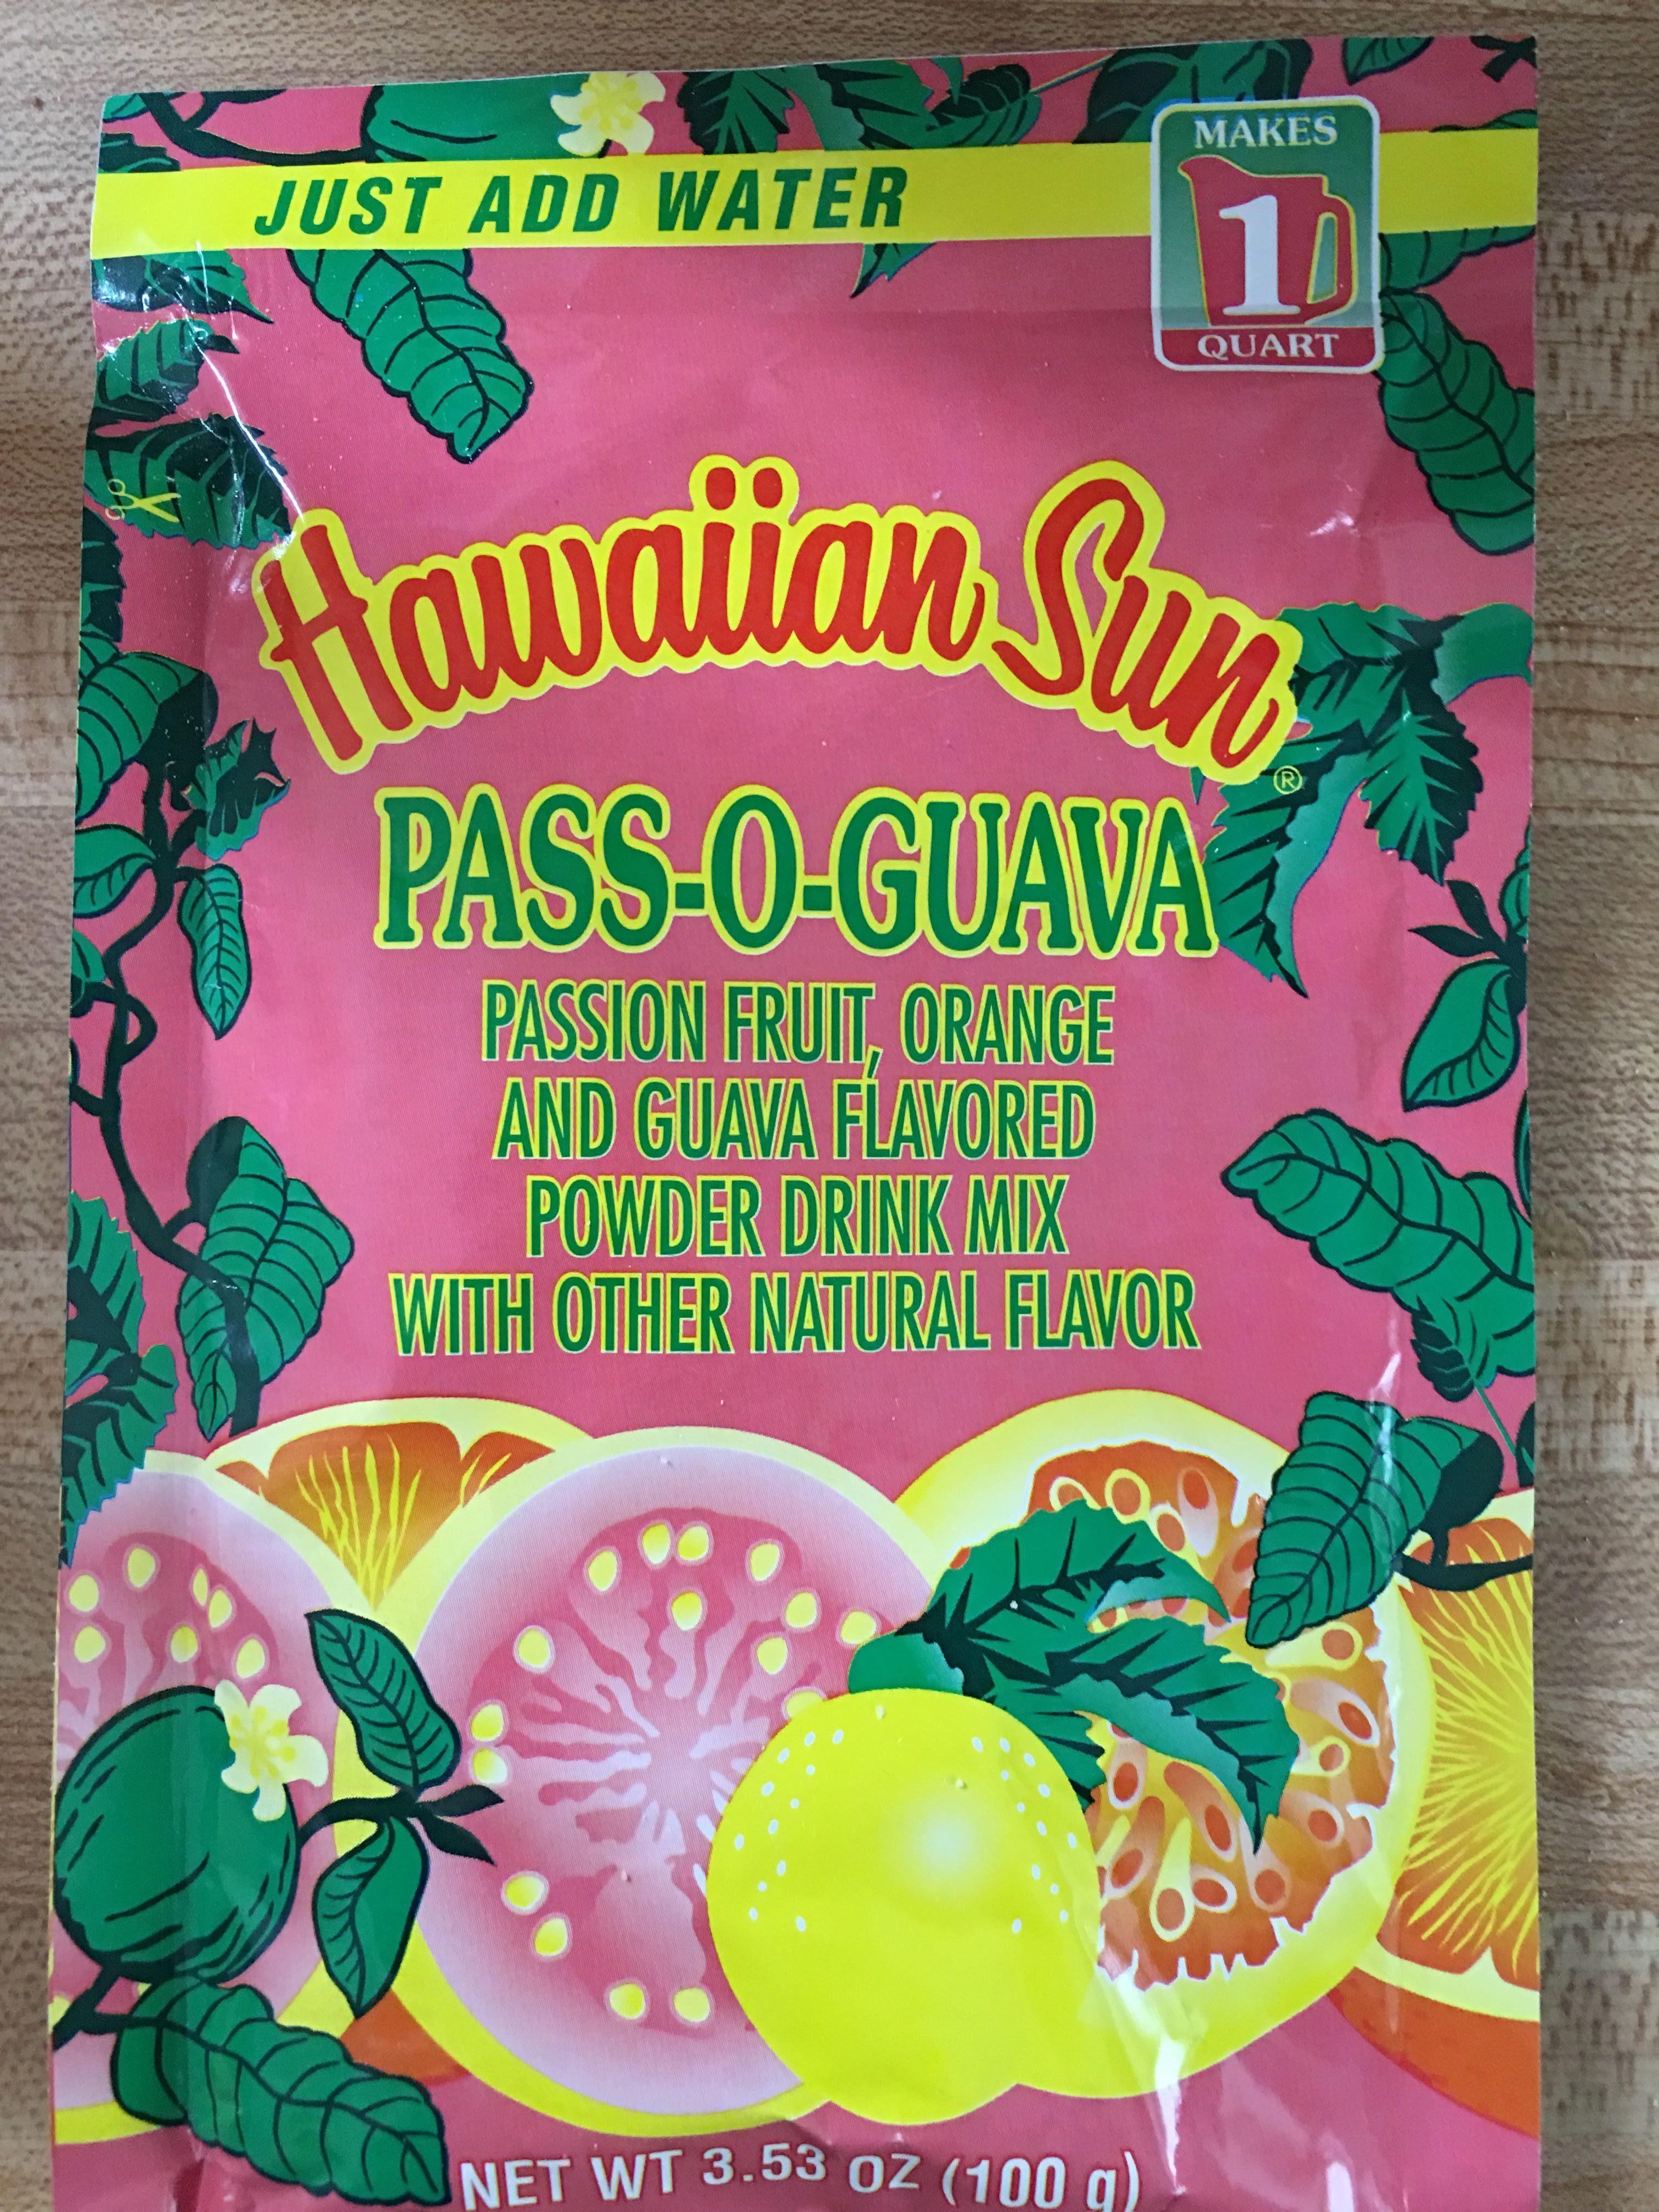 Pass-o-Guava - Product - en